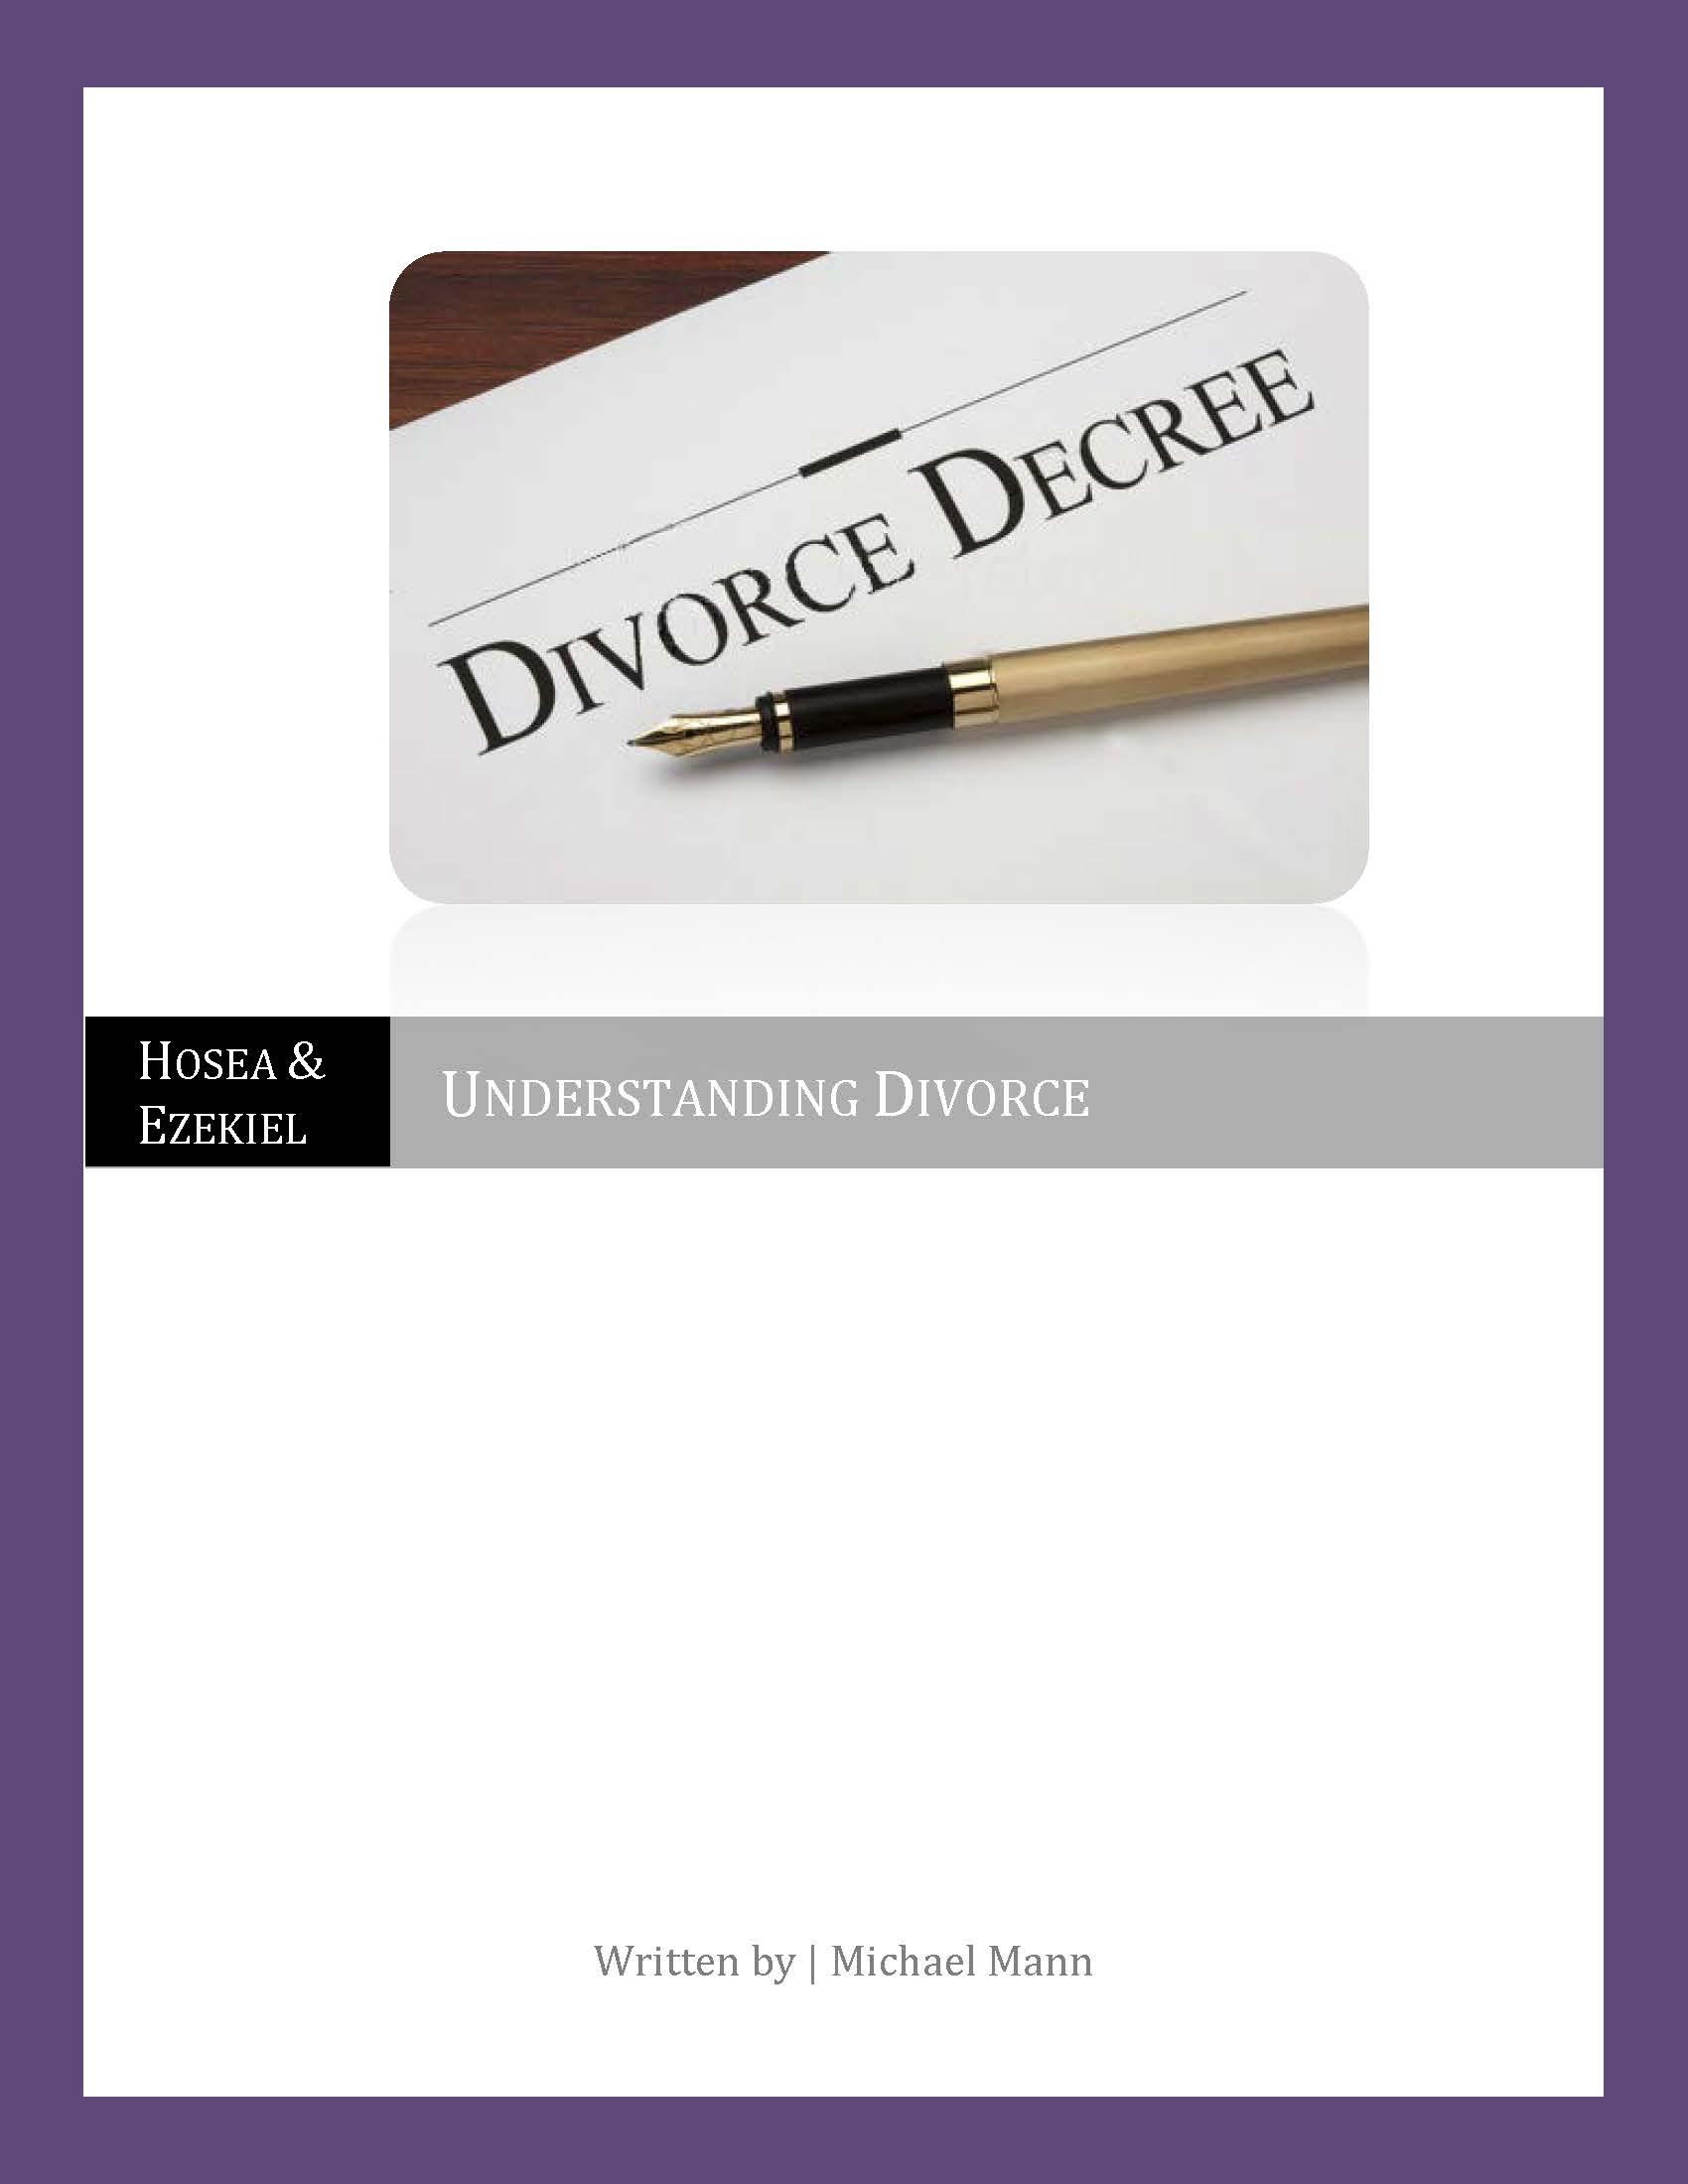 Divorce Bible Verses - Bible Study Tools